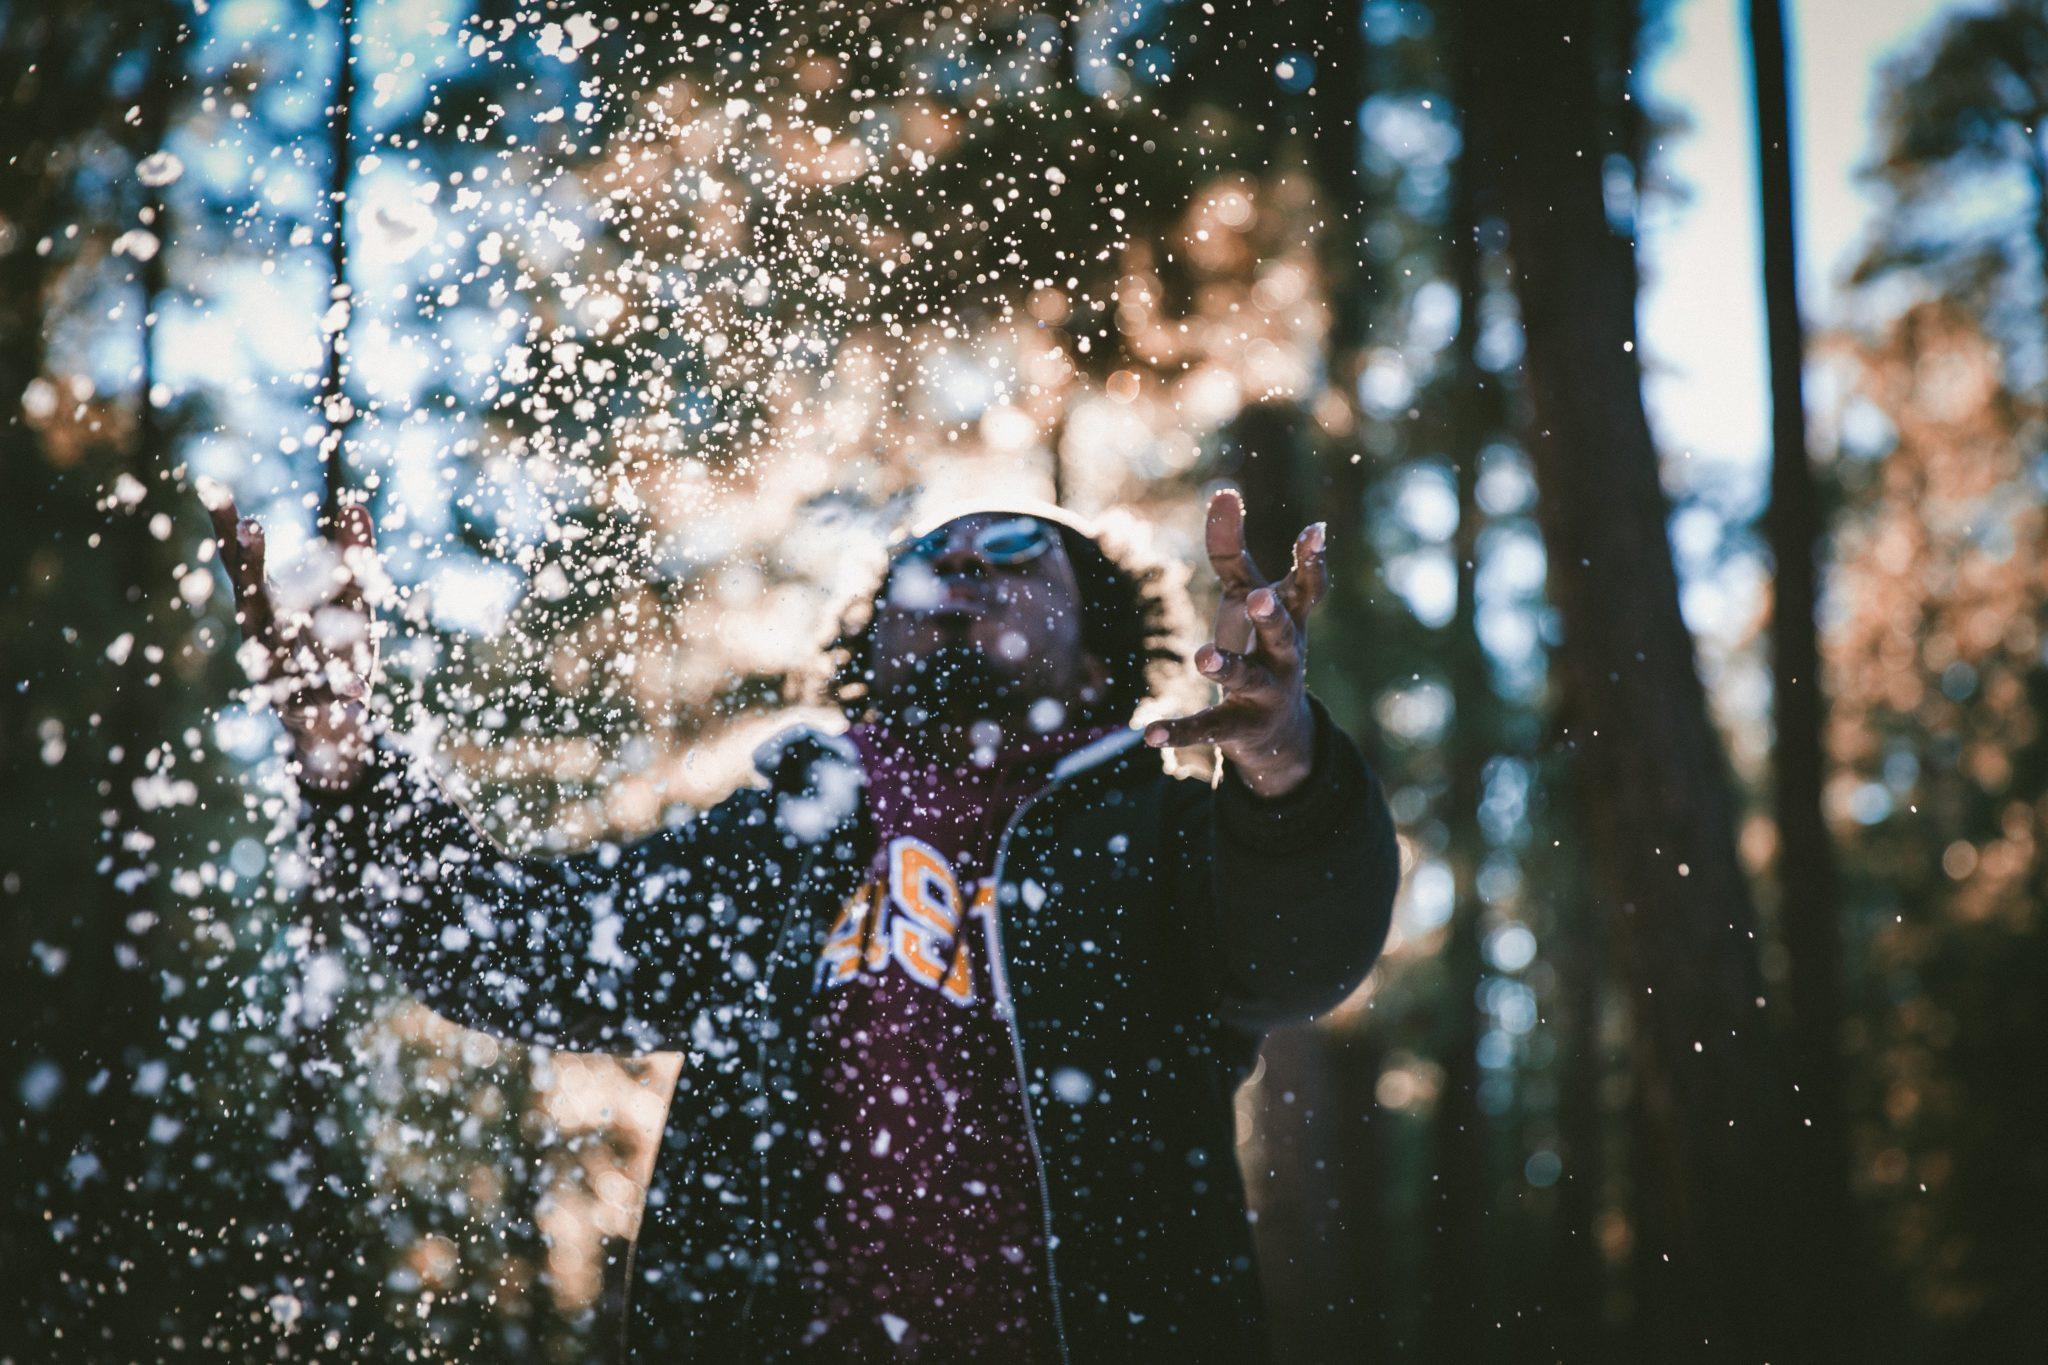 Man trowing snow